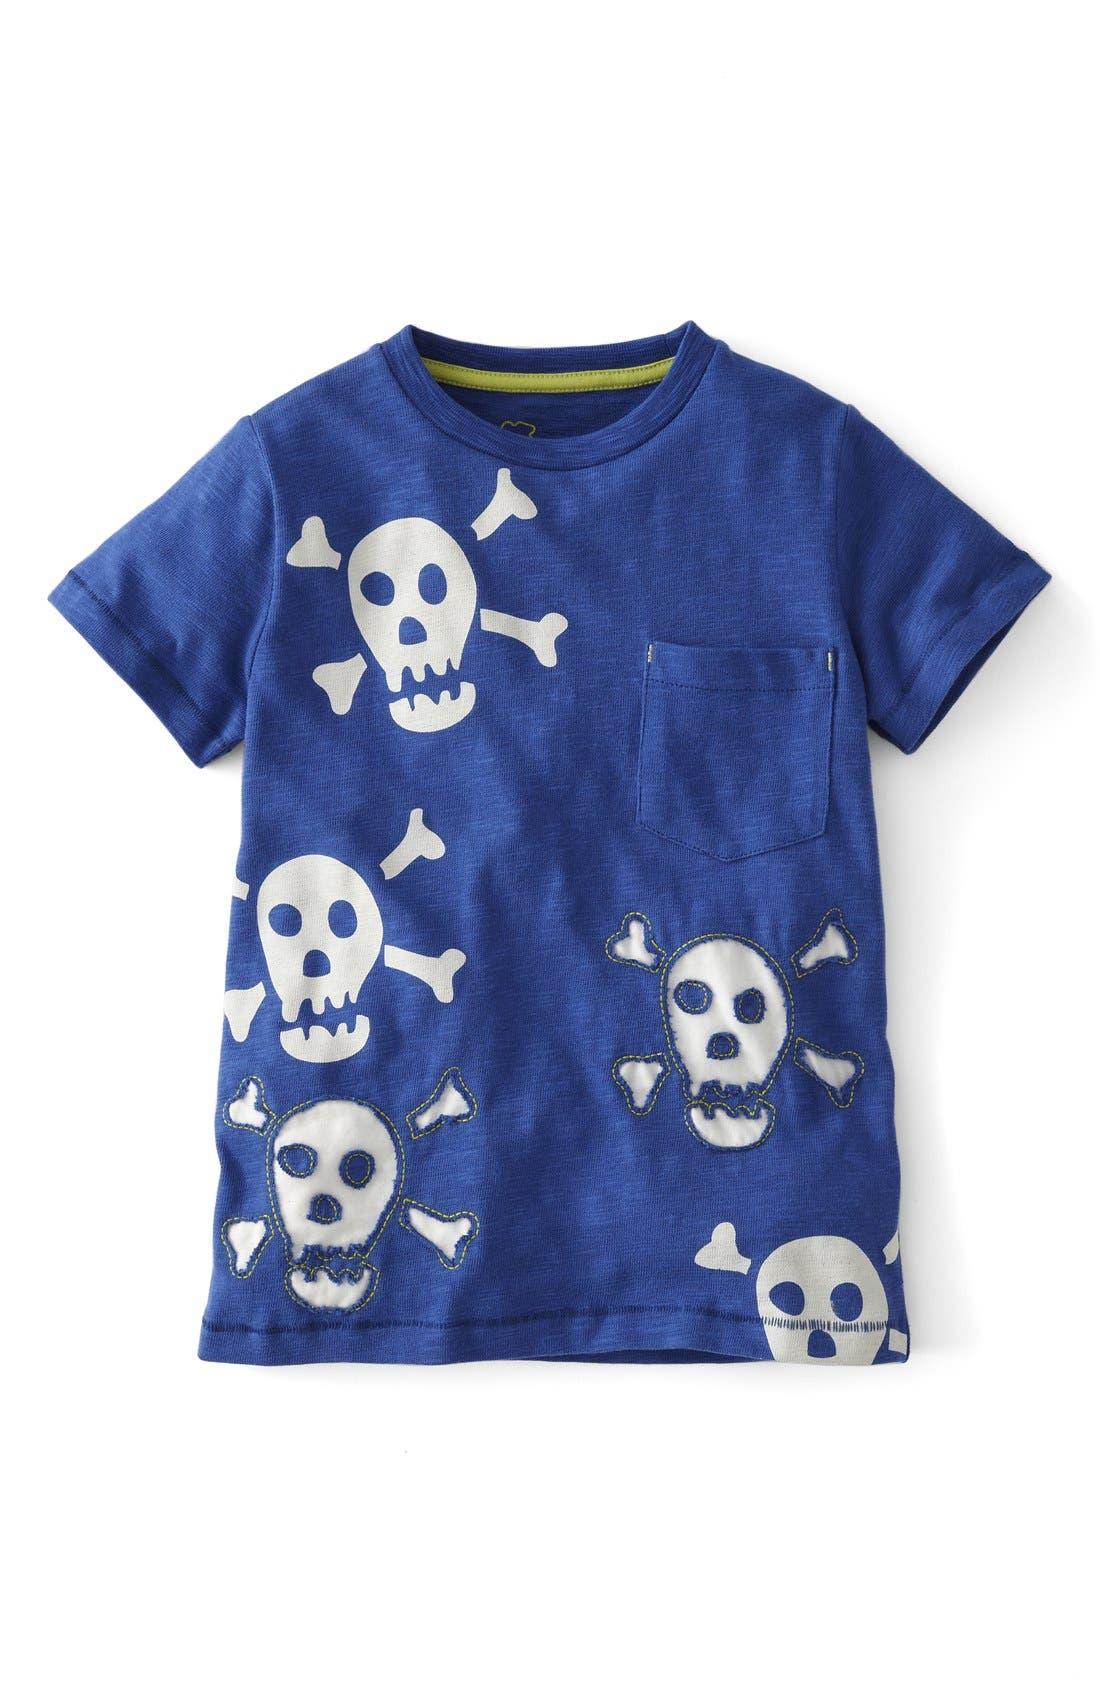 Alternate Image 1 Selected - Mini Boden 'Reverse Appliqué' T-Shirt (Toddler Boys, Little Boys & Big Boys)